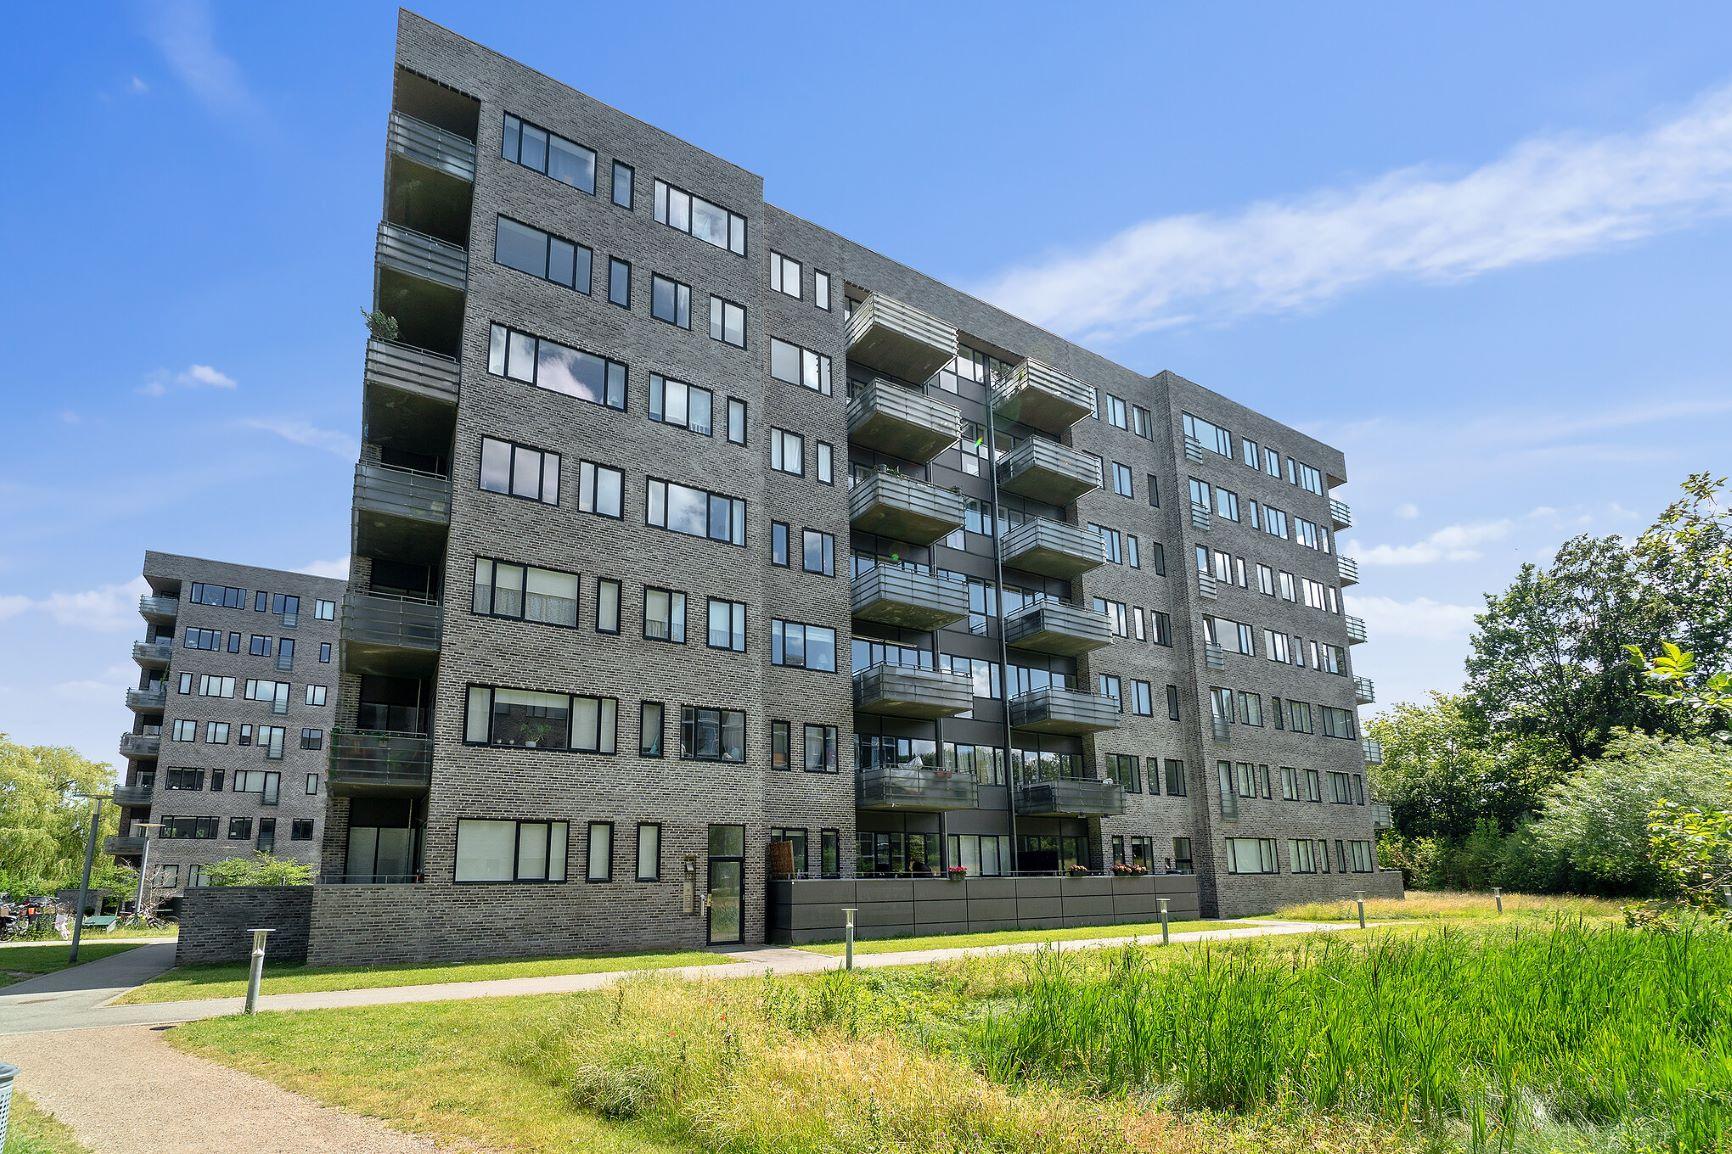 Lejebolig på Gyngemose Parkvej 16, 4. mf., 2860 Søborg